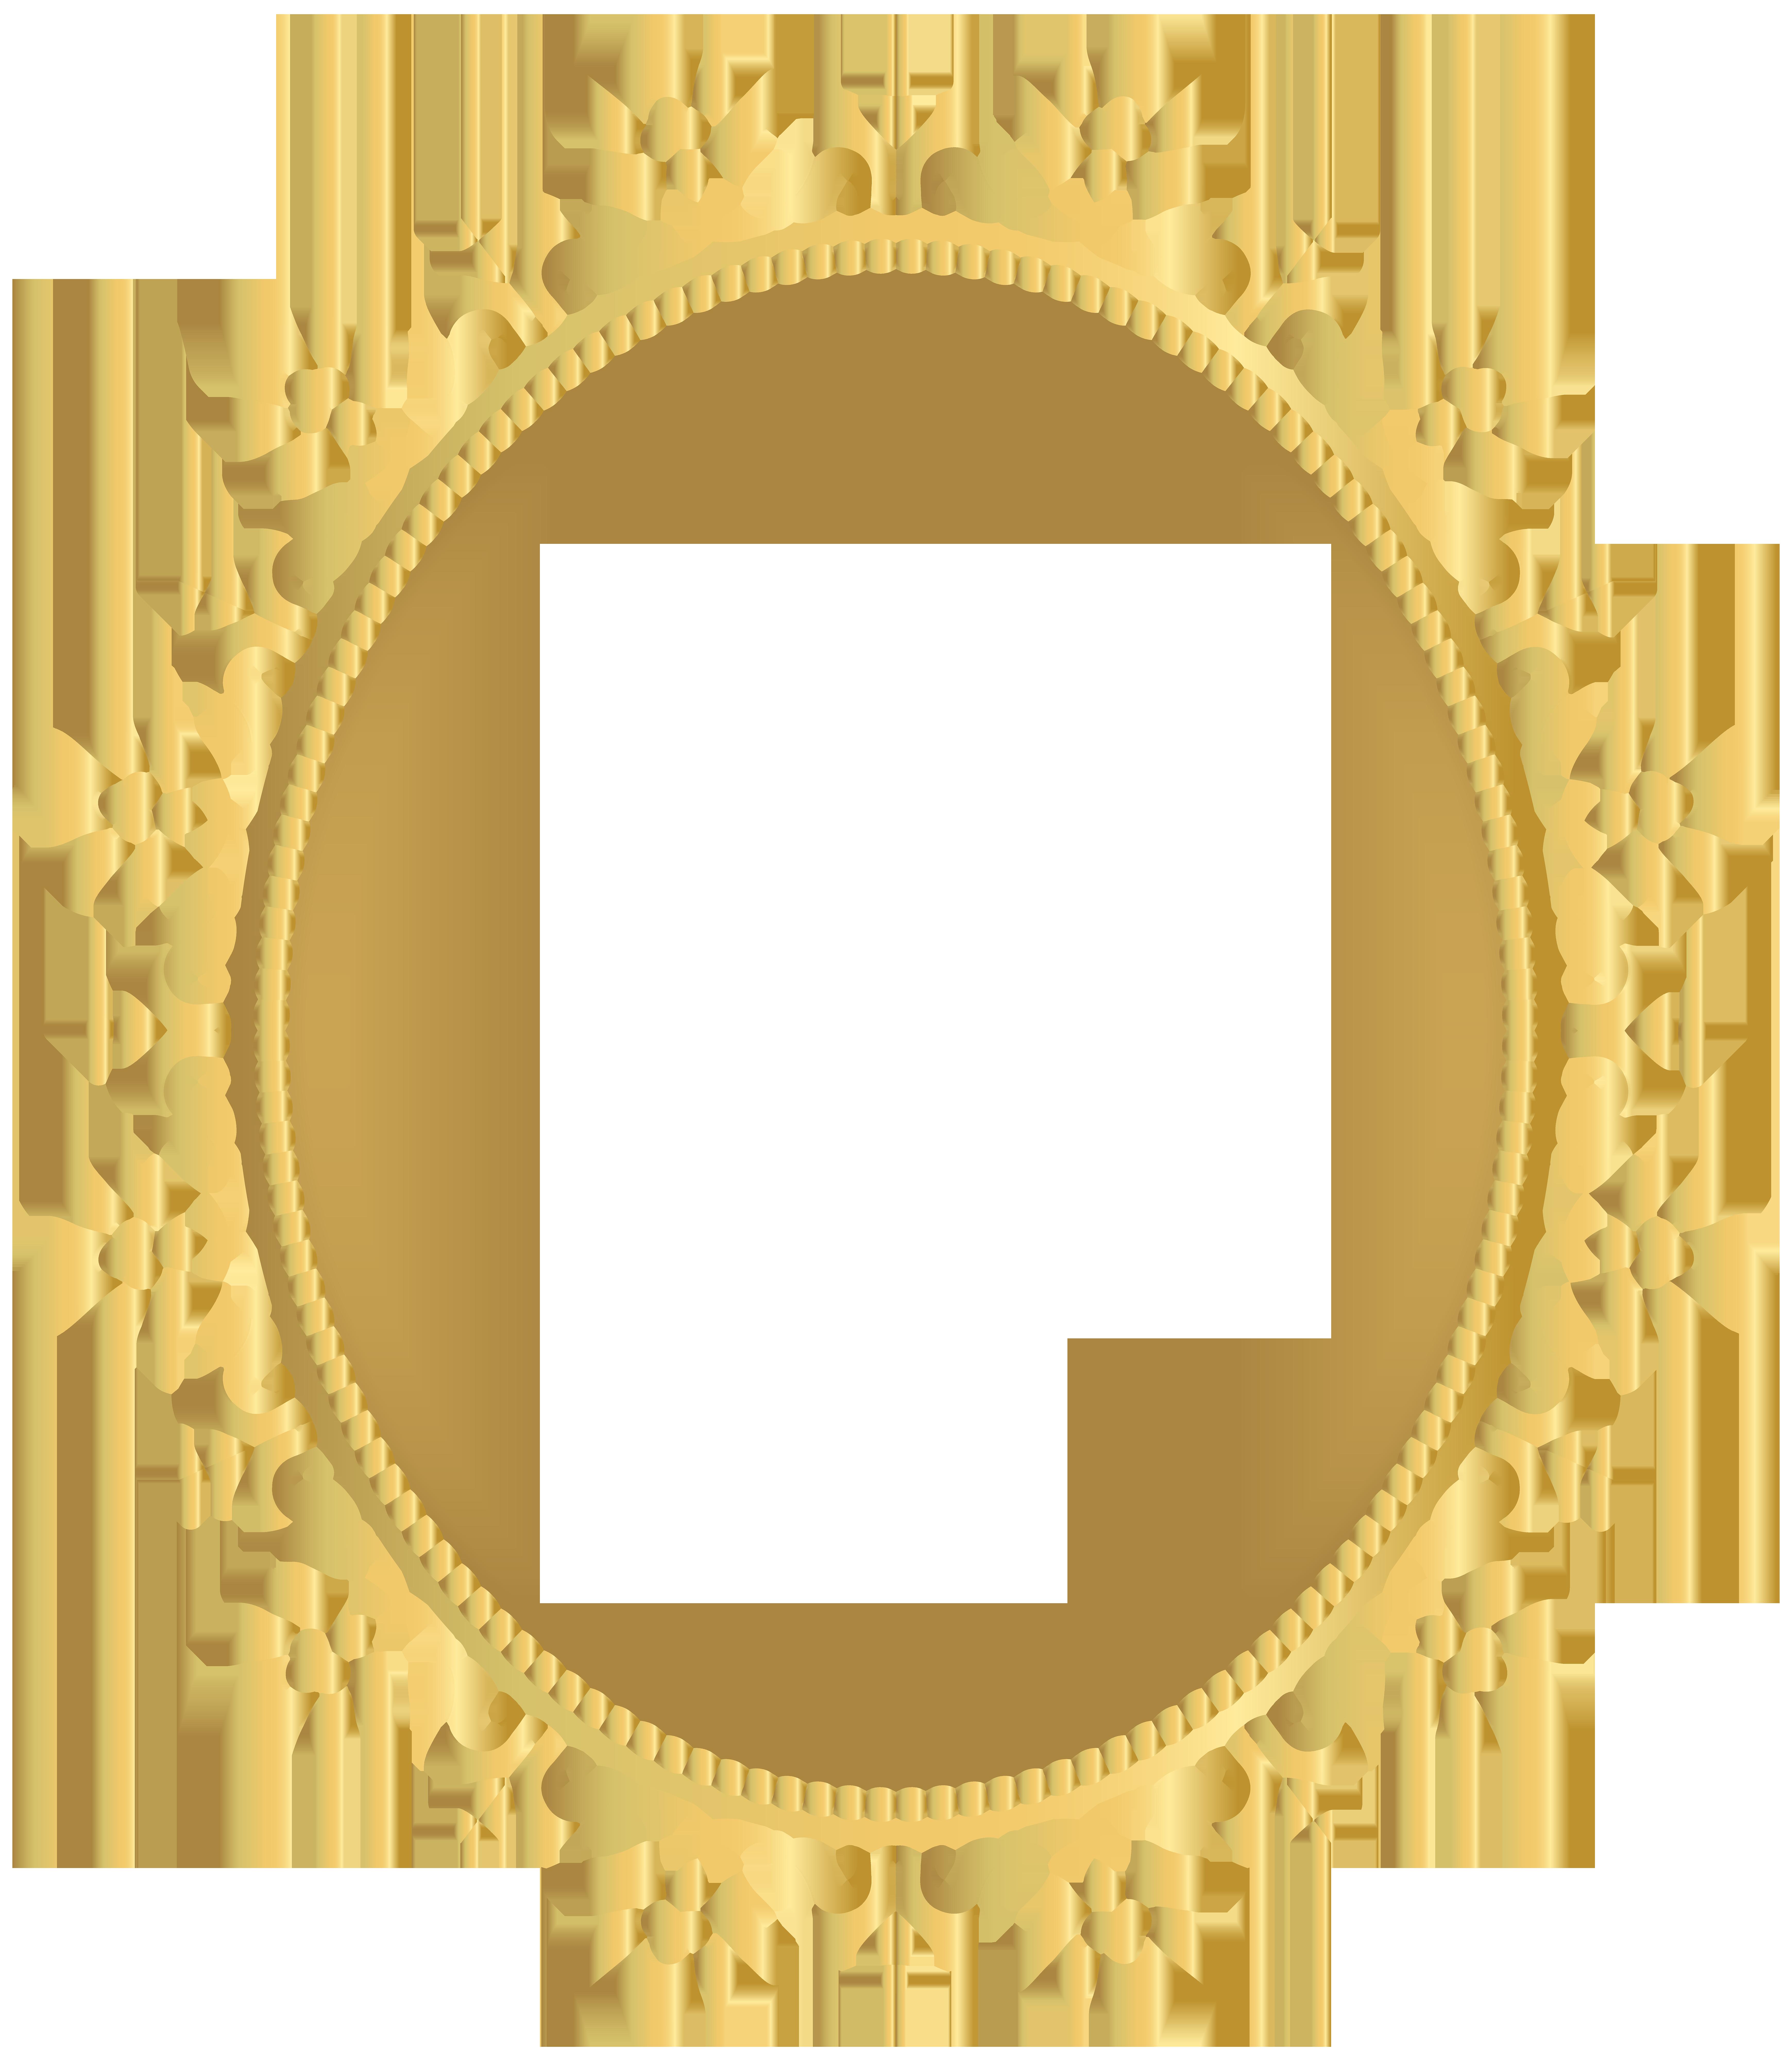 6957x8000 Oval Decorative Border Frame Transparent Clip Art Png Image